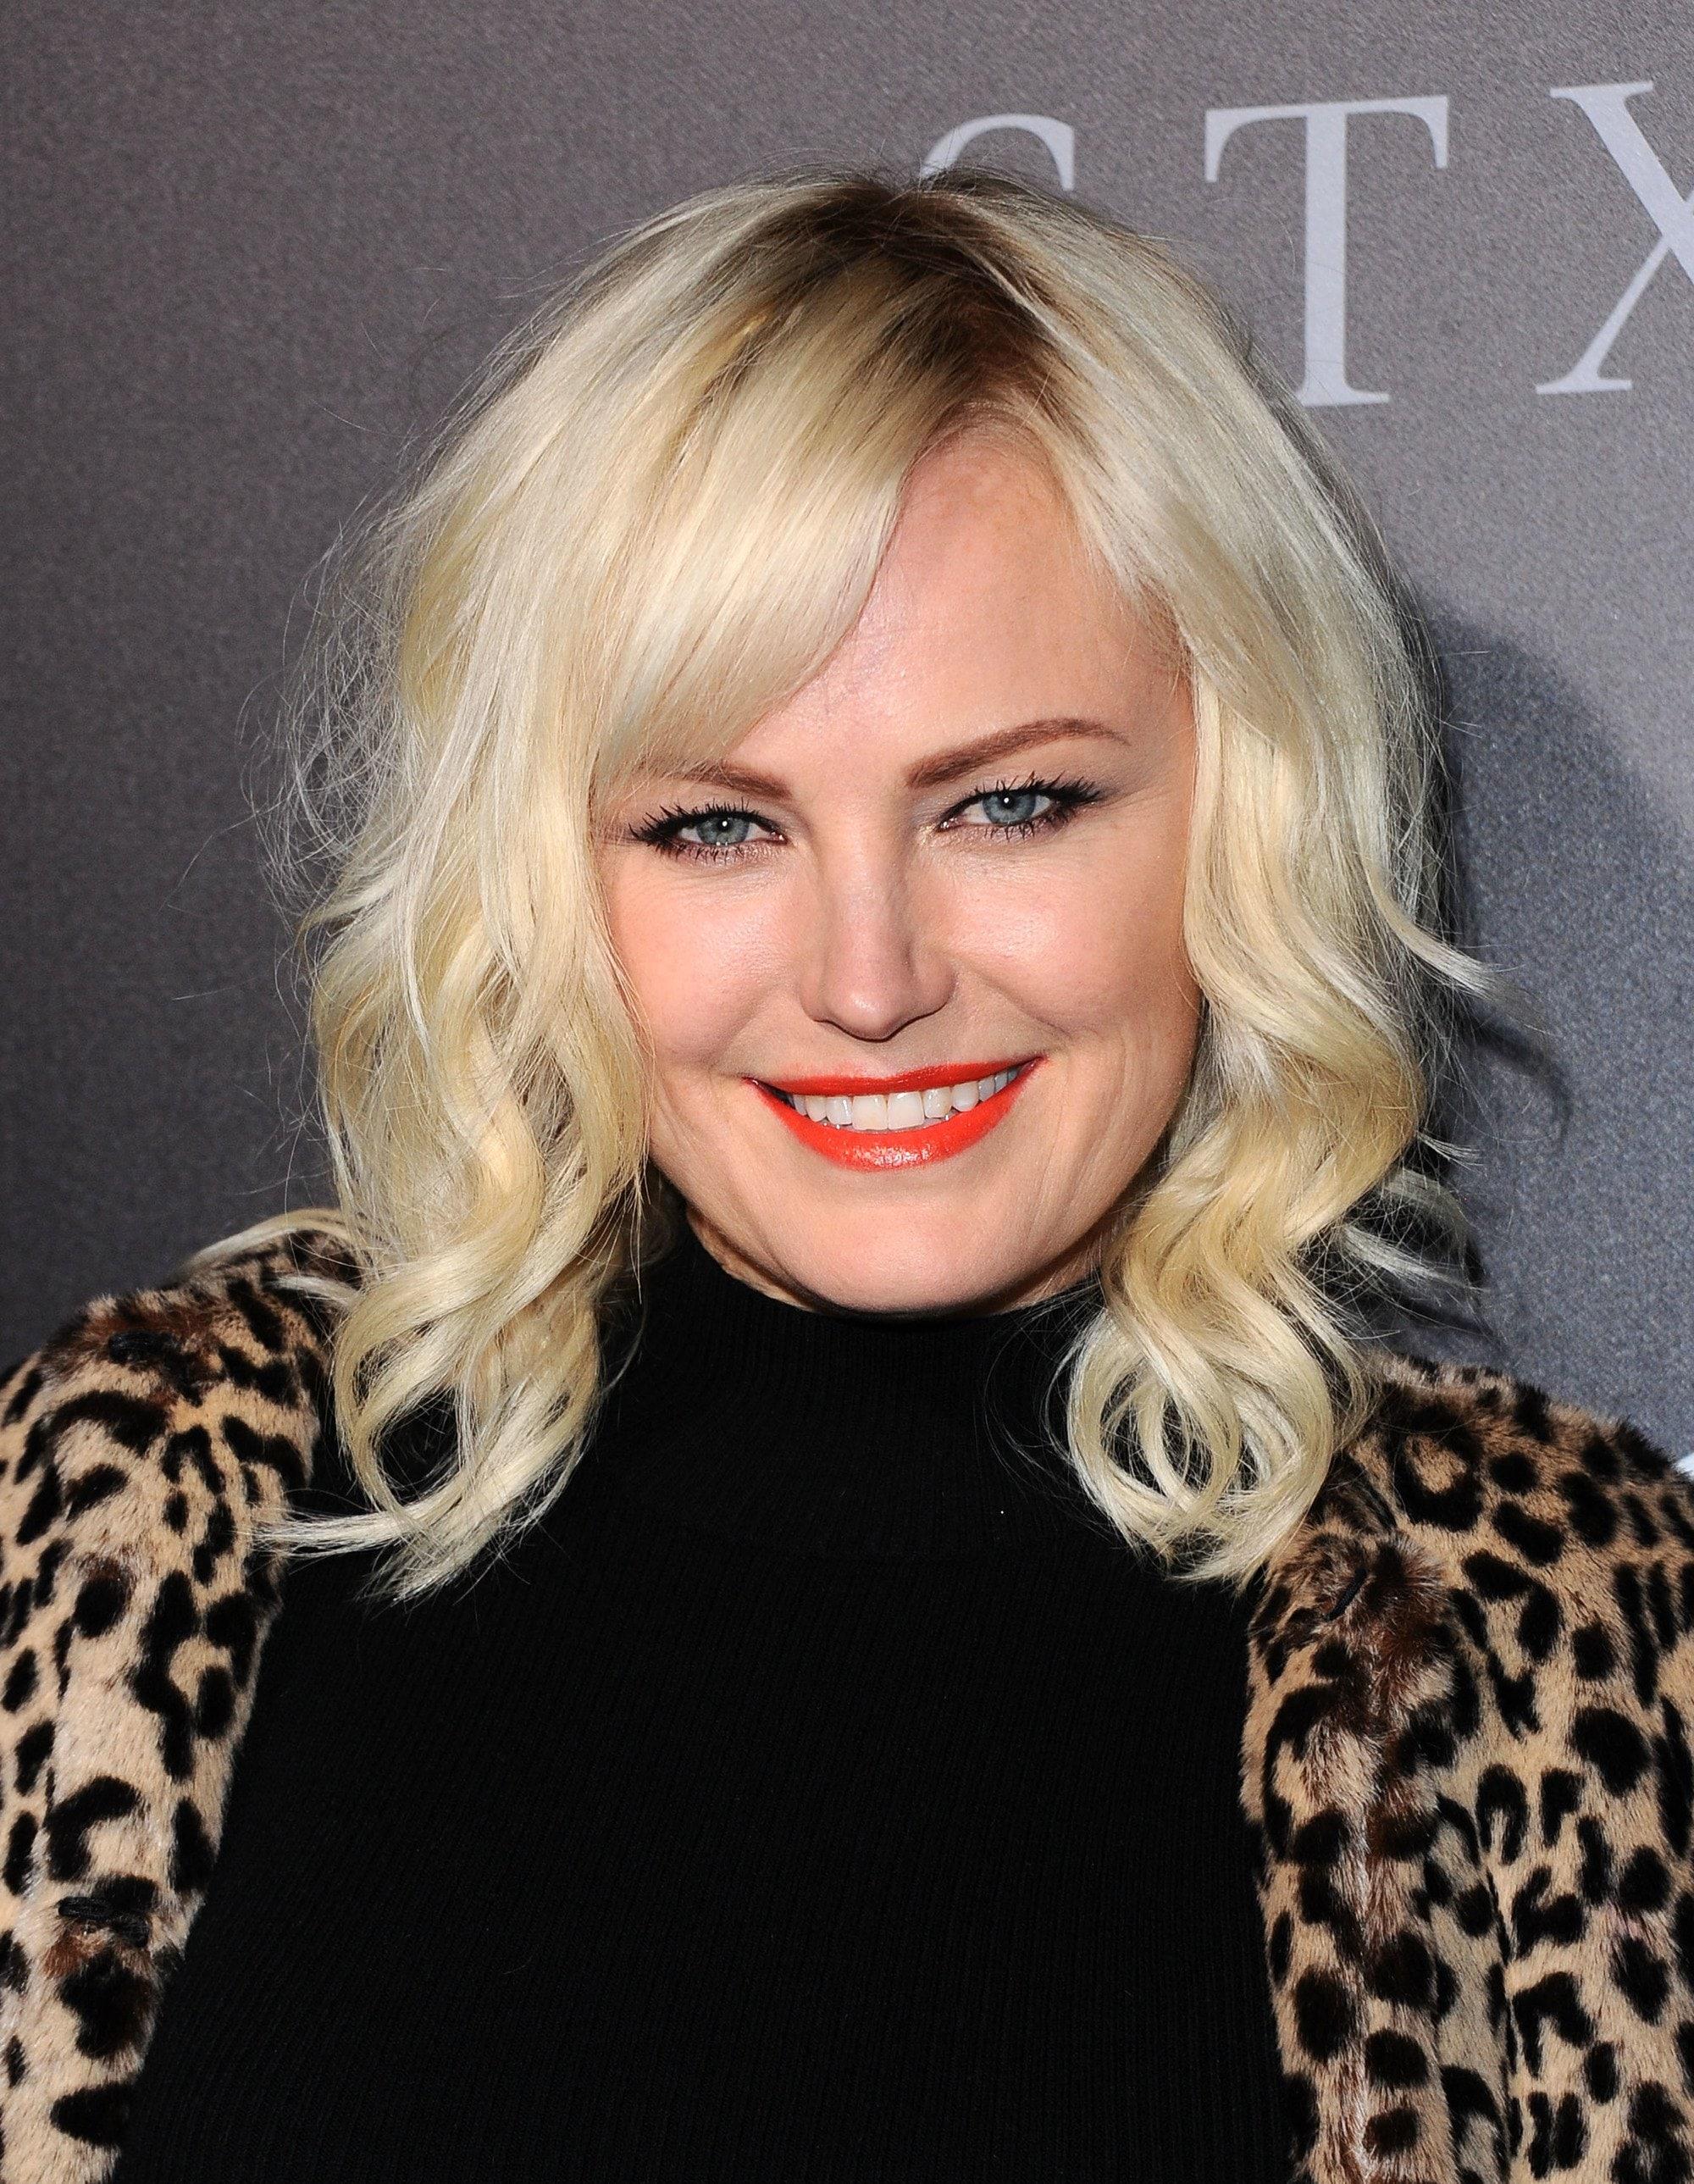 Malin Akerman - blonde hair in side part with side fringe